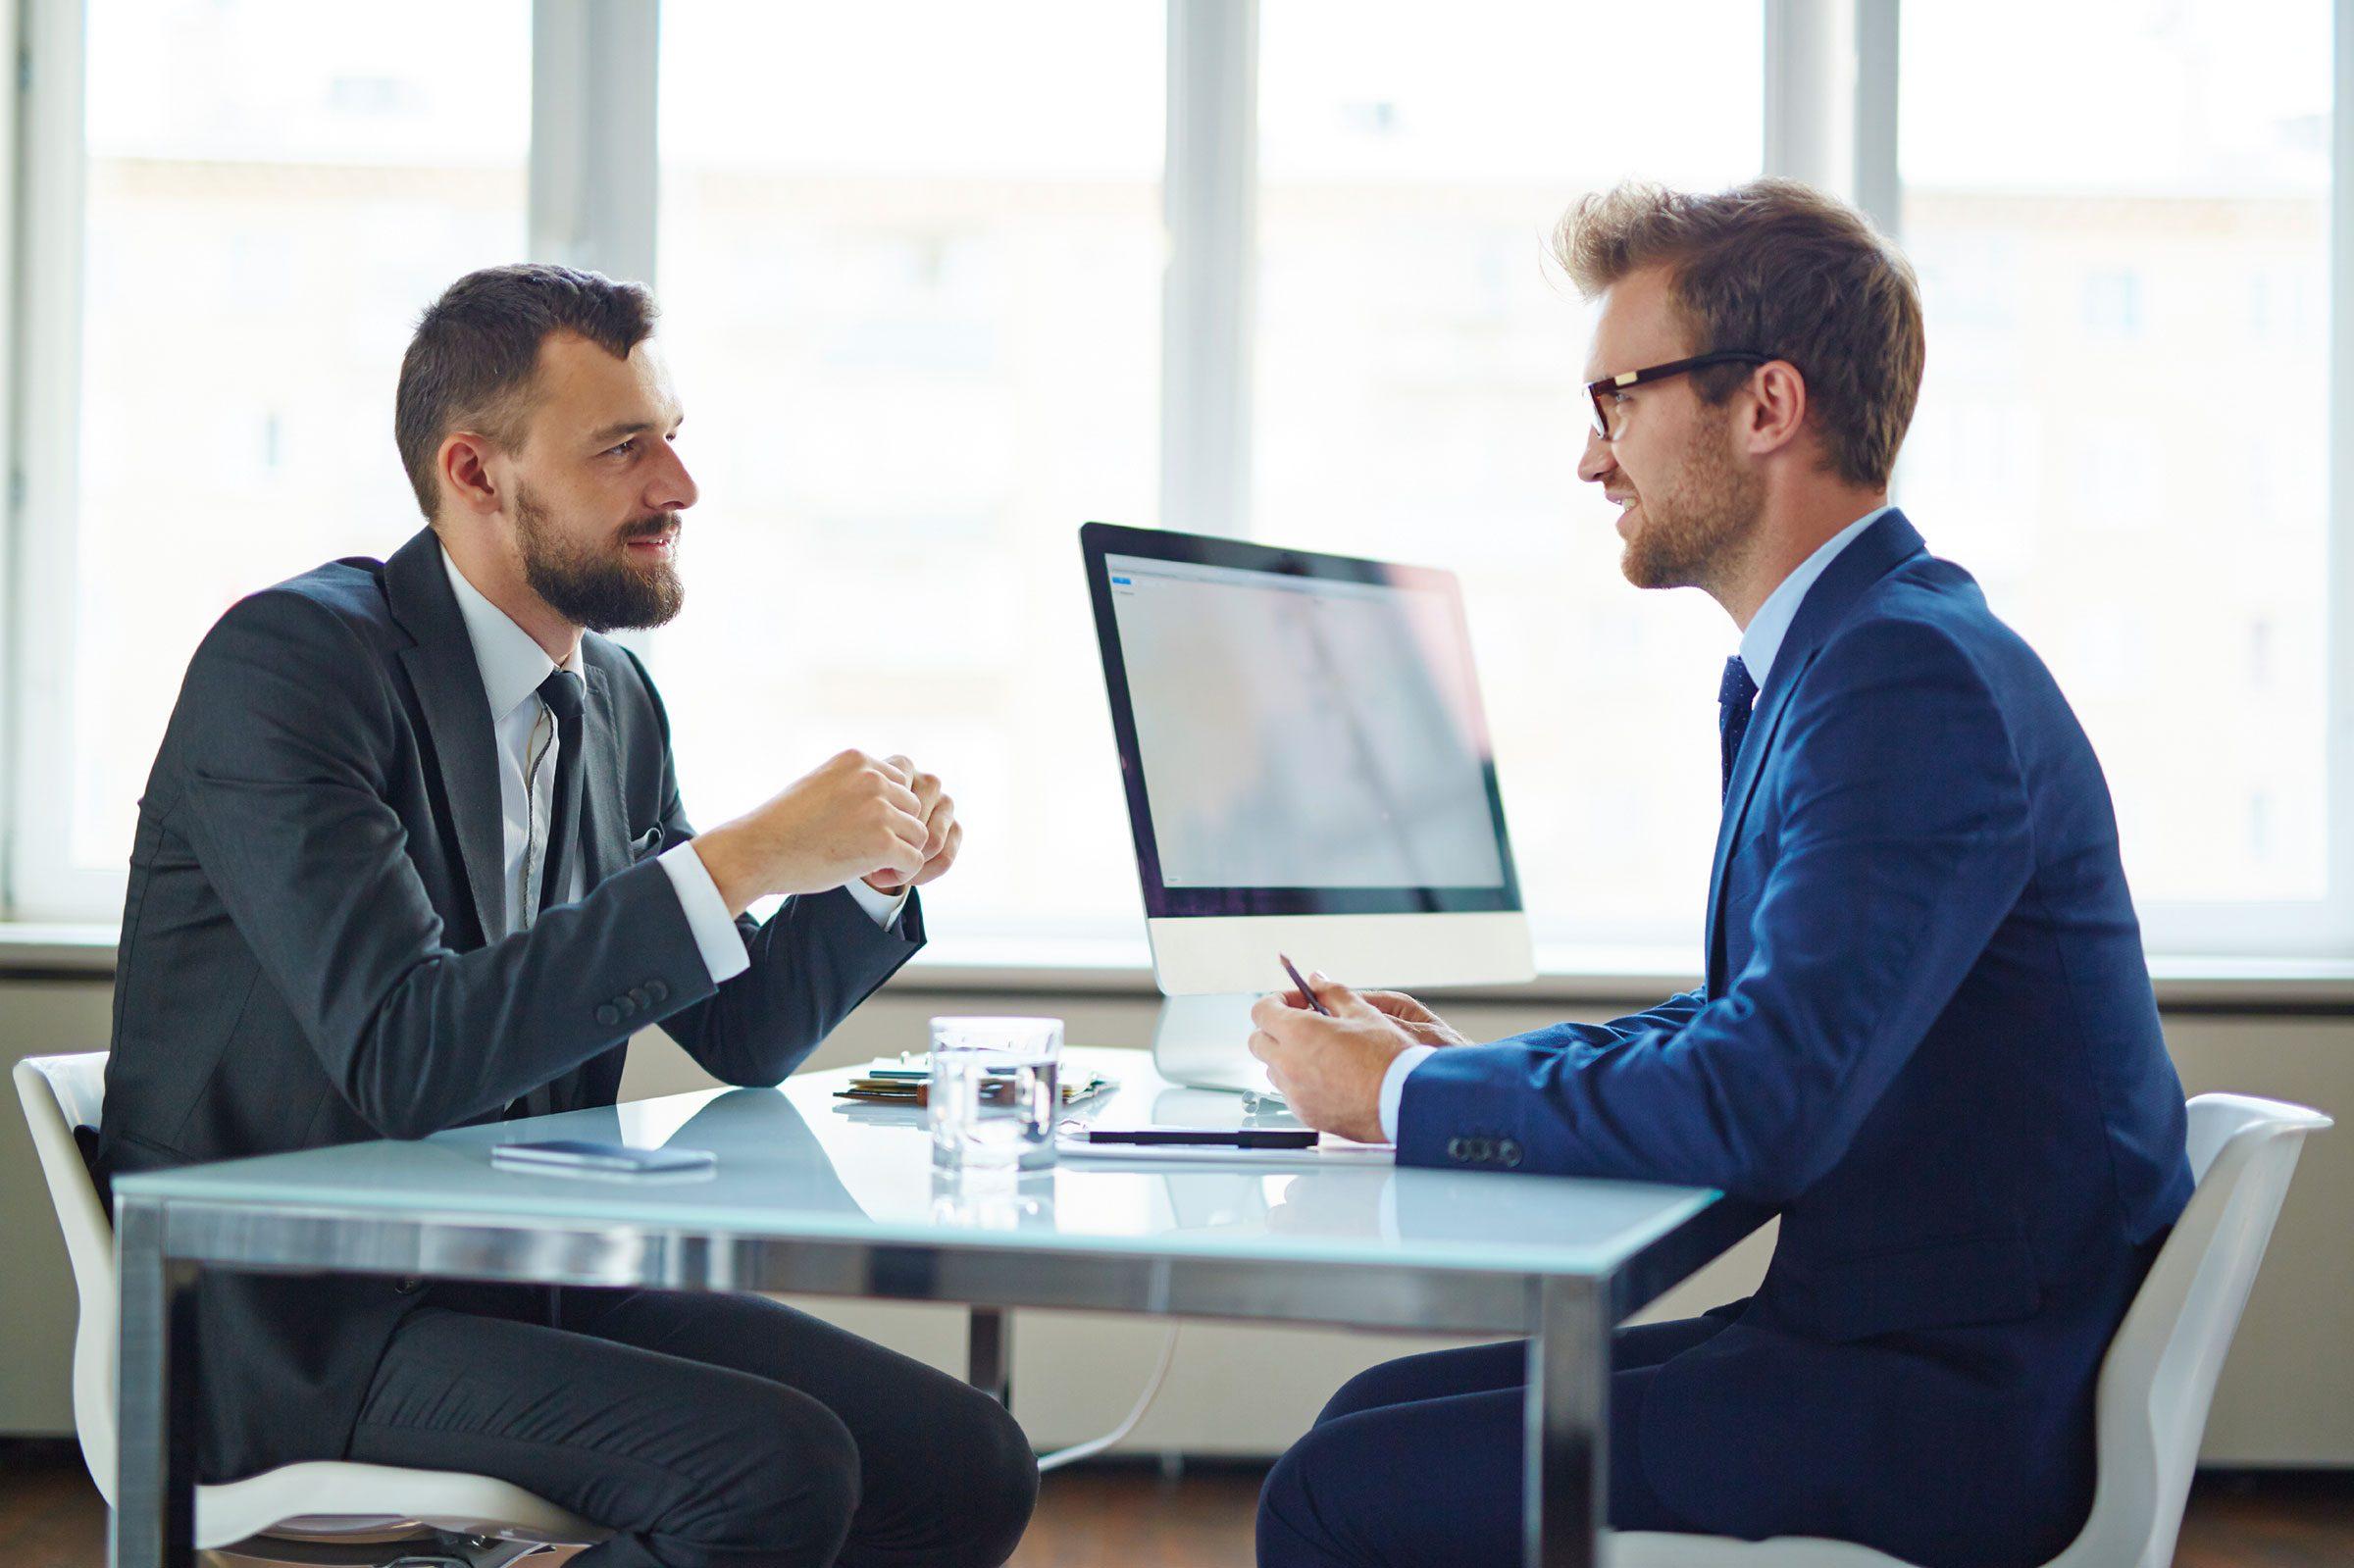 Funny Interviews Meet The Dumbest Job Applicants Reader